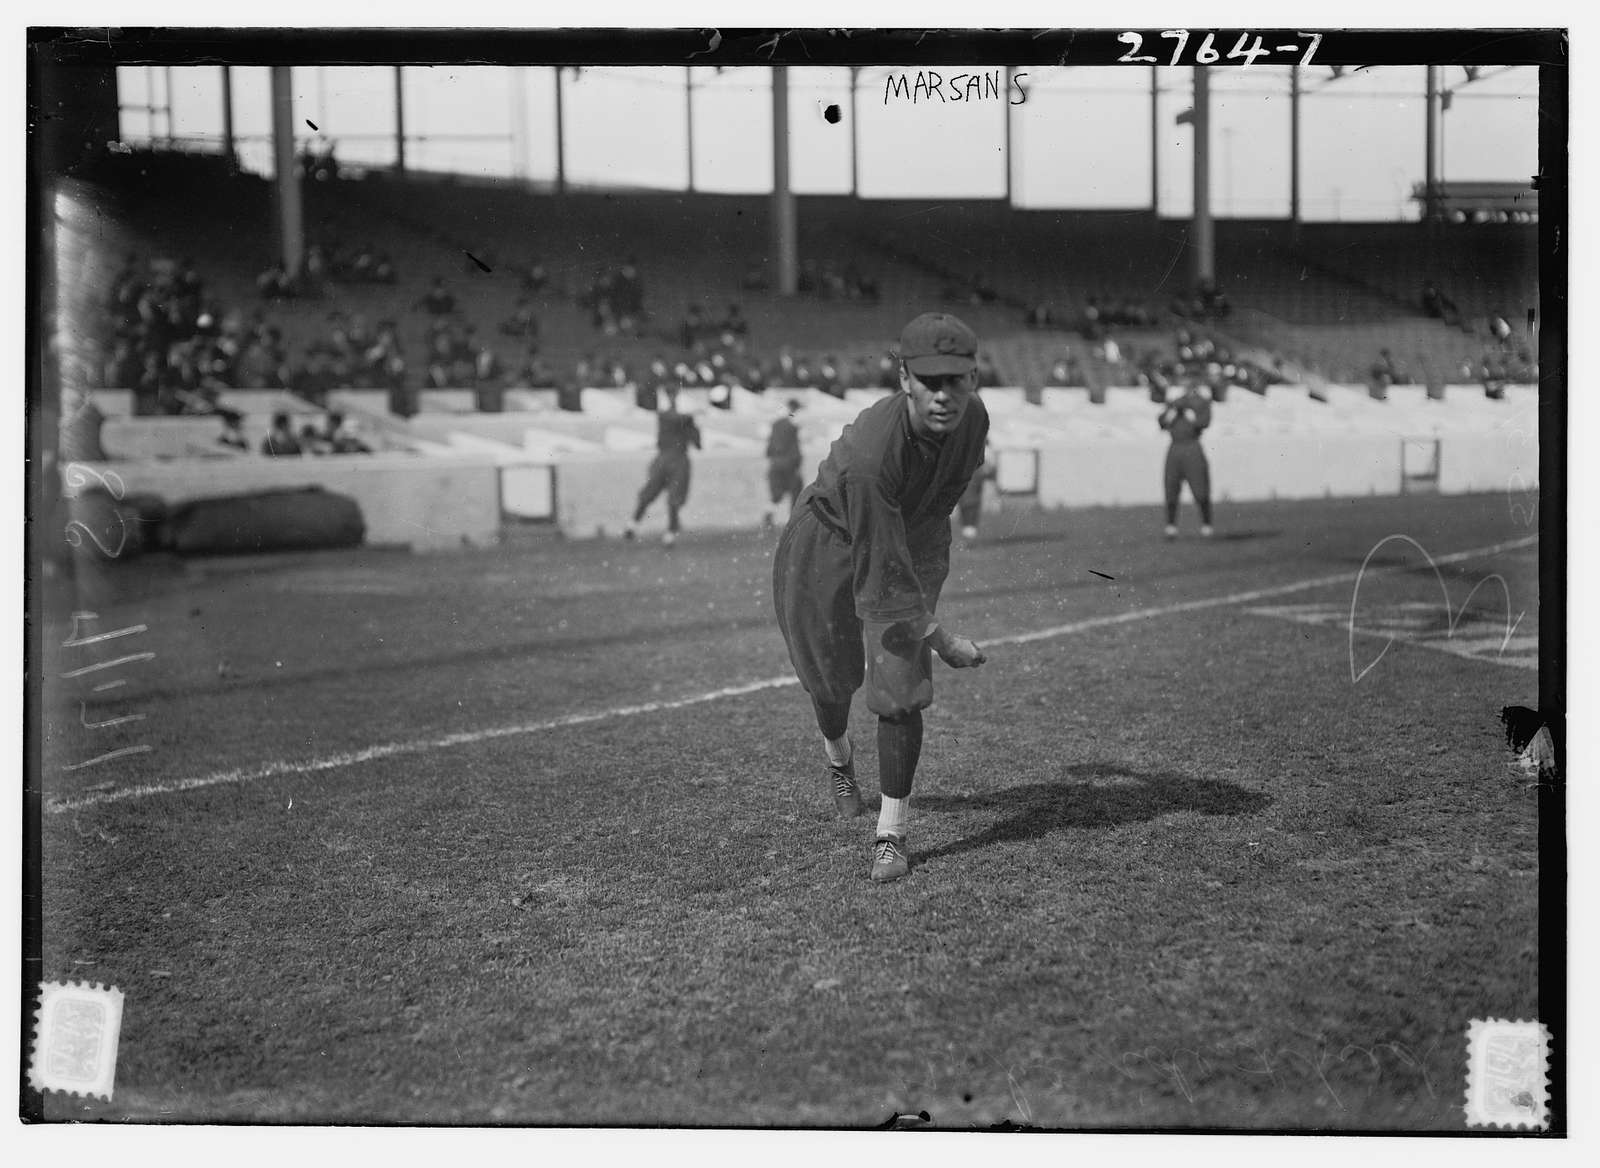 Armando Marsans, Cincinnati NL, at Polo Grounds, NY (baseball)